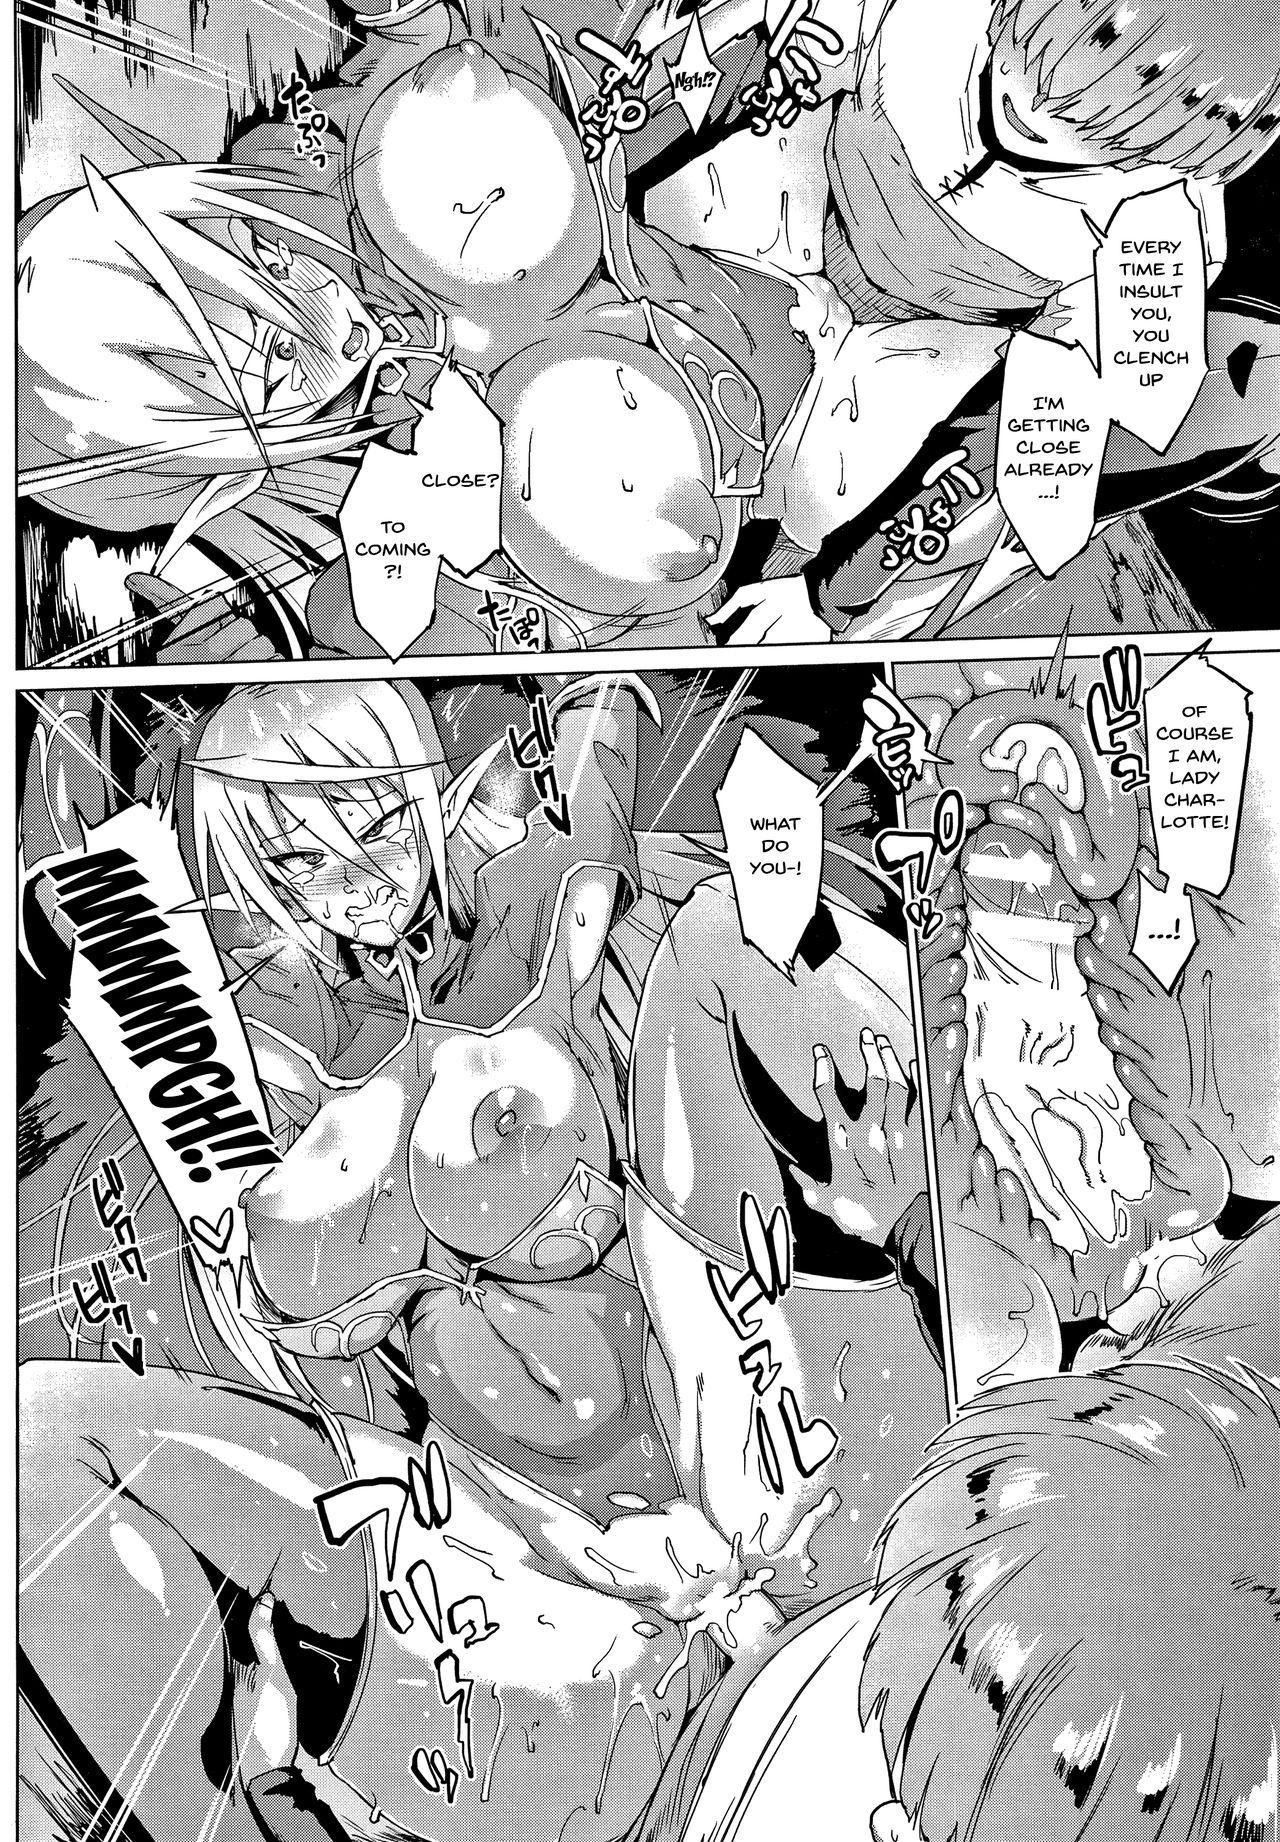 [Fan no Hitori] Sennen Reijou ~My Lady, My Master~  Ch.1-6 [English] {Doujins.com} 16